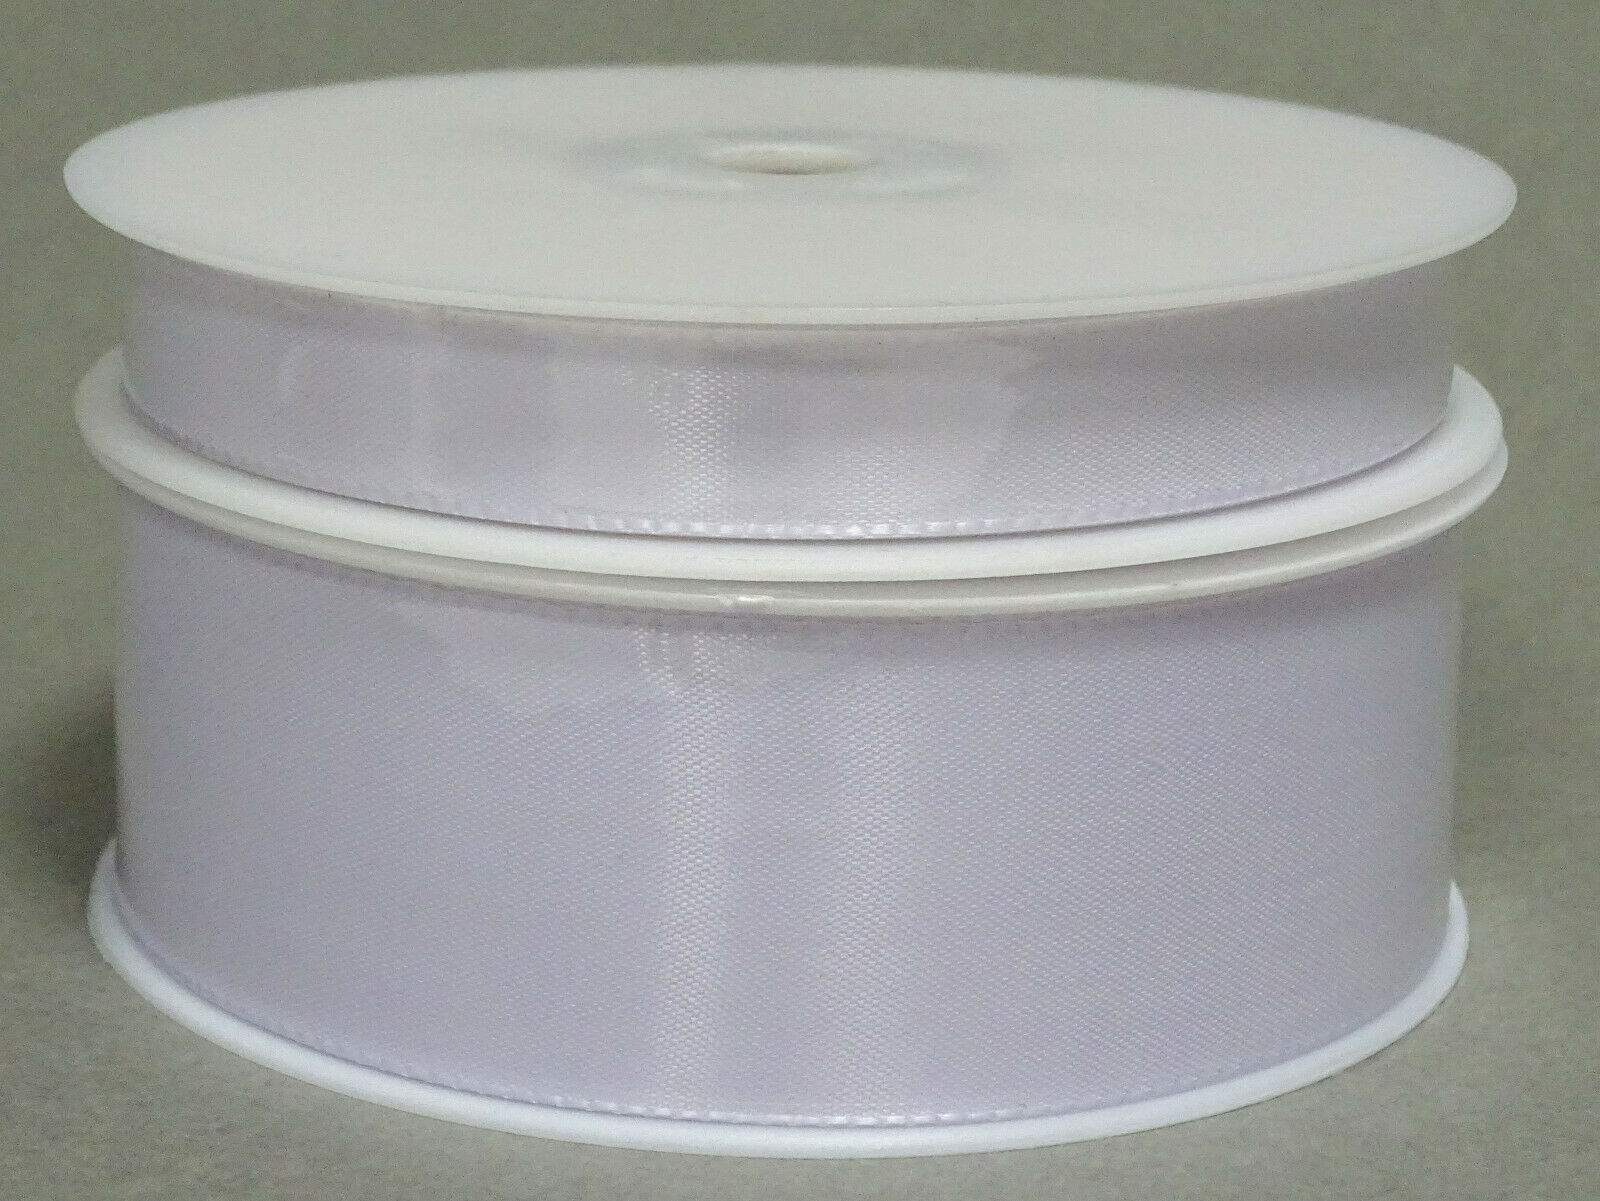 Seidenband Schleifenband 50 m x 15 / 25 / 40mm Dekoband ab 0,08€/m Geschenkband  - Weiß 101, 25 mm x 50 m